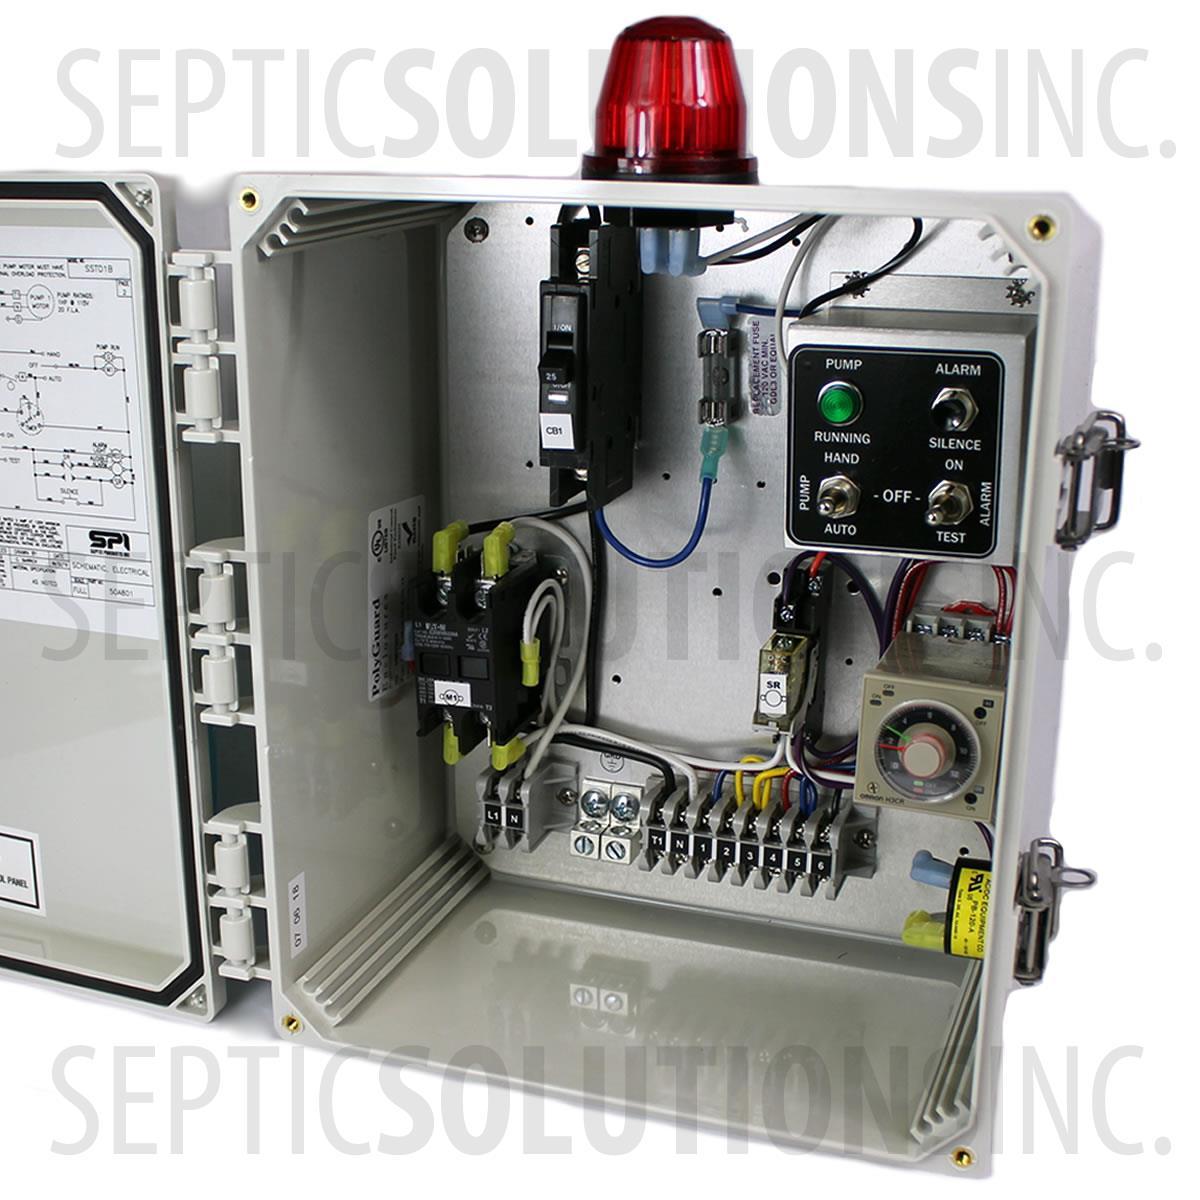 Spi Model Sstd1b Simplex Time Dosing Control Panel